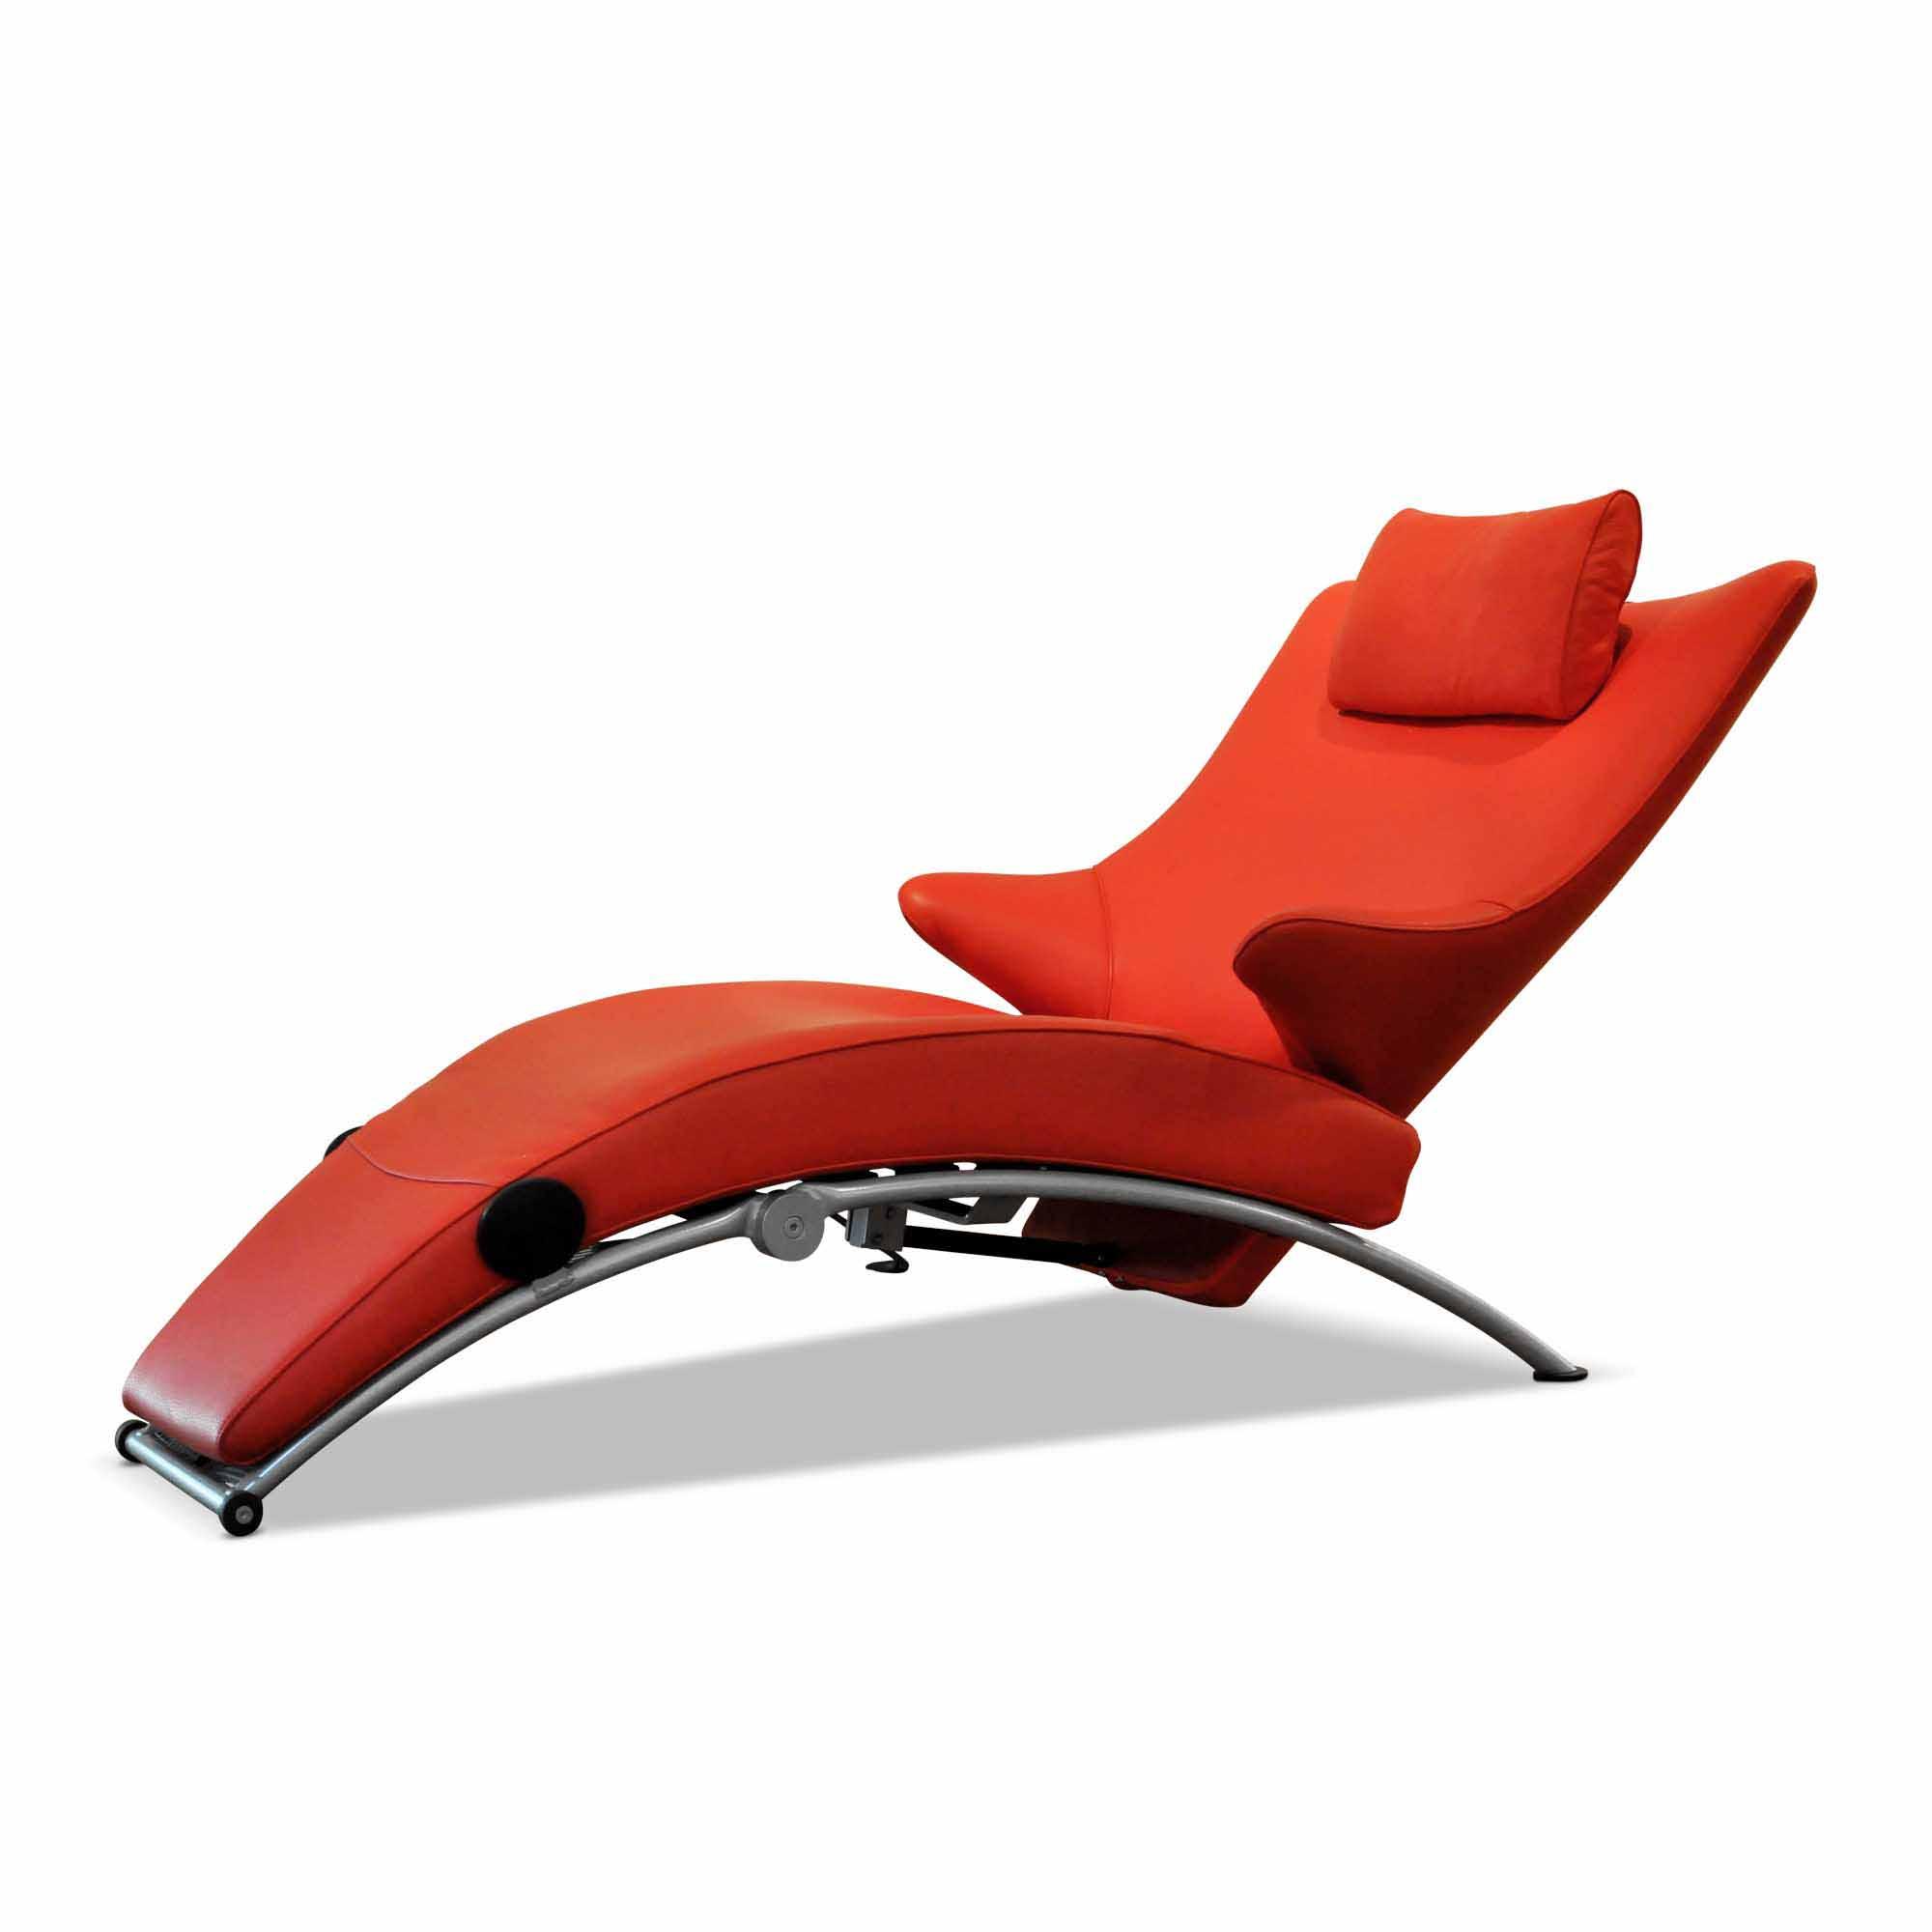 sessel wk 699 s mit liegefunktion wk wohnen sessel. Black Bedroom Furniture Sets. Home Design Ideas